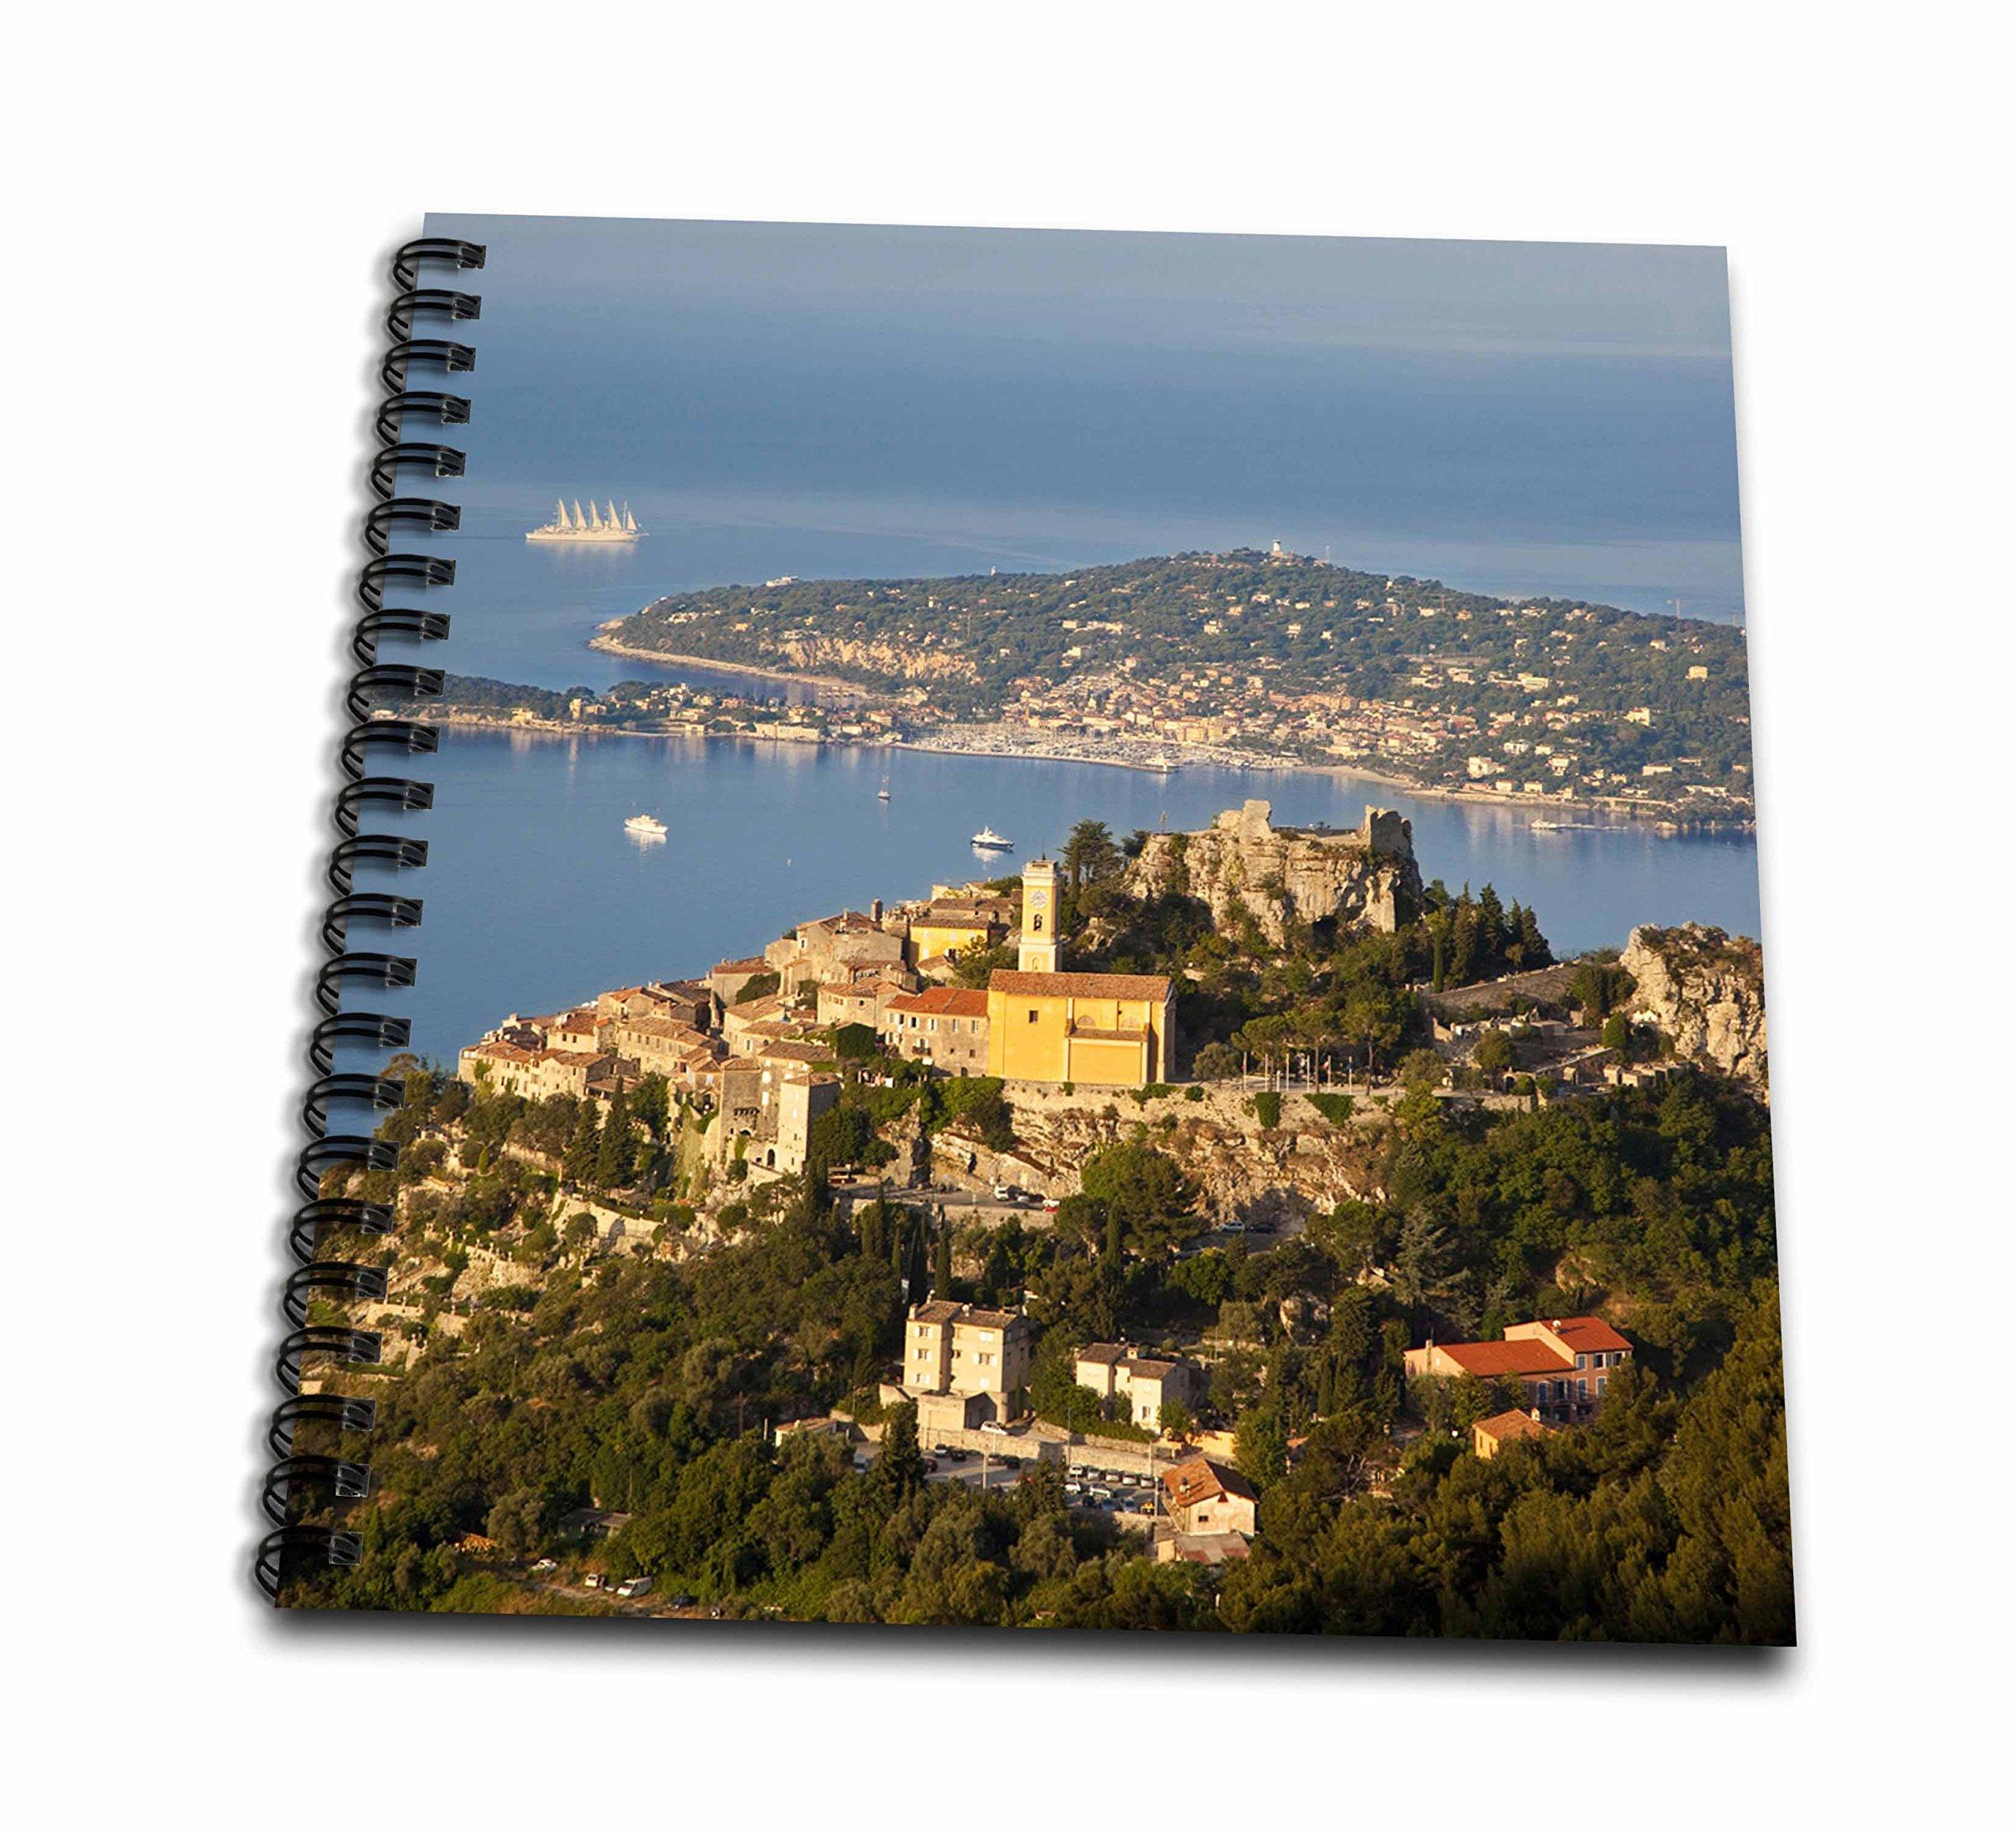 3D Rose db_136091_2 3dRose Eze, St. Jean-Cap Ferrat, Provence, France-EU09 BJN0348-Brian Jannsen-Memory Book inch, 12'' x 12''